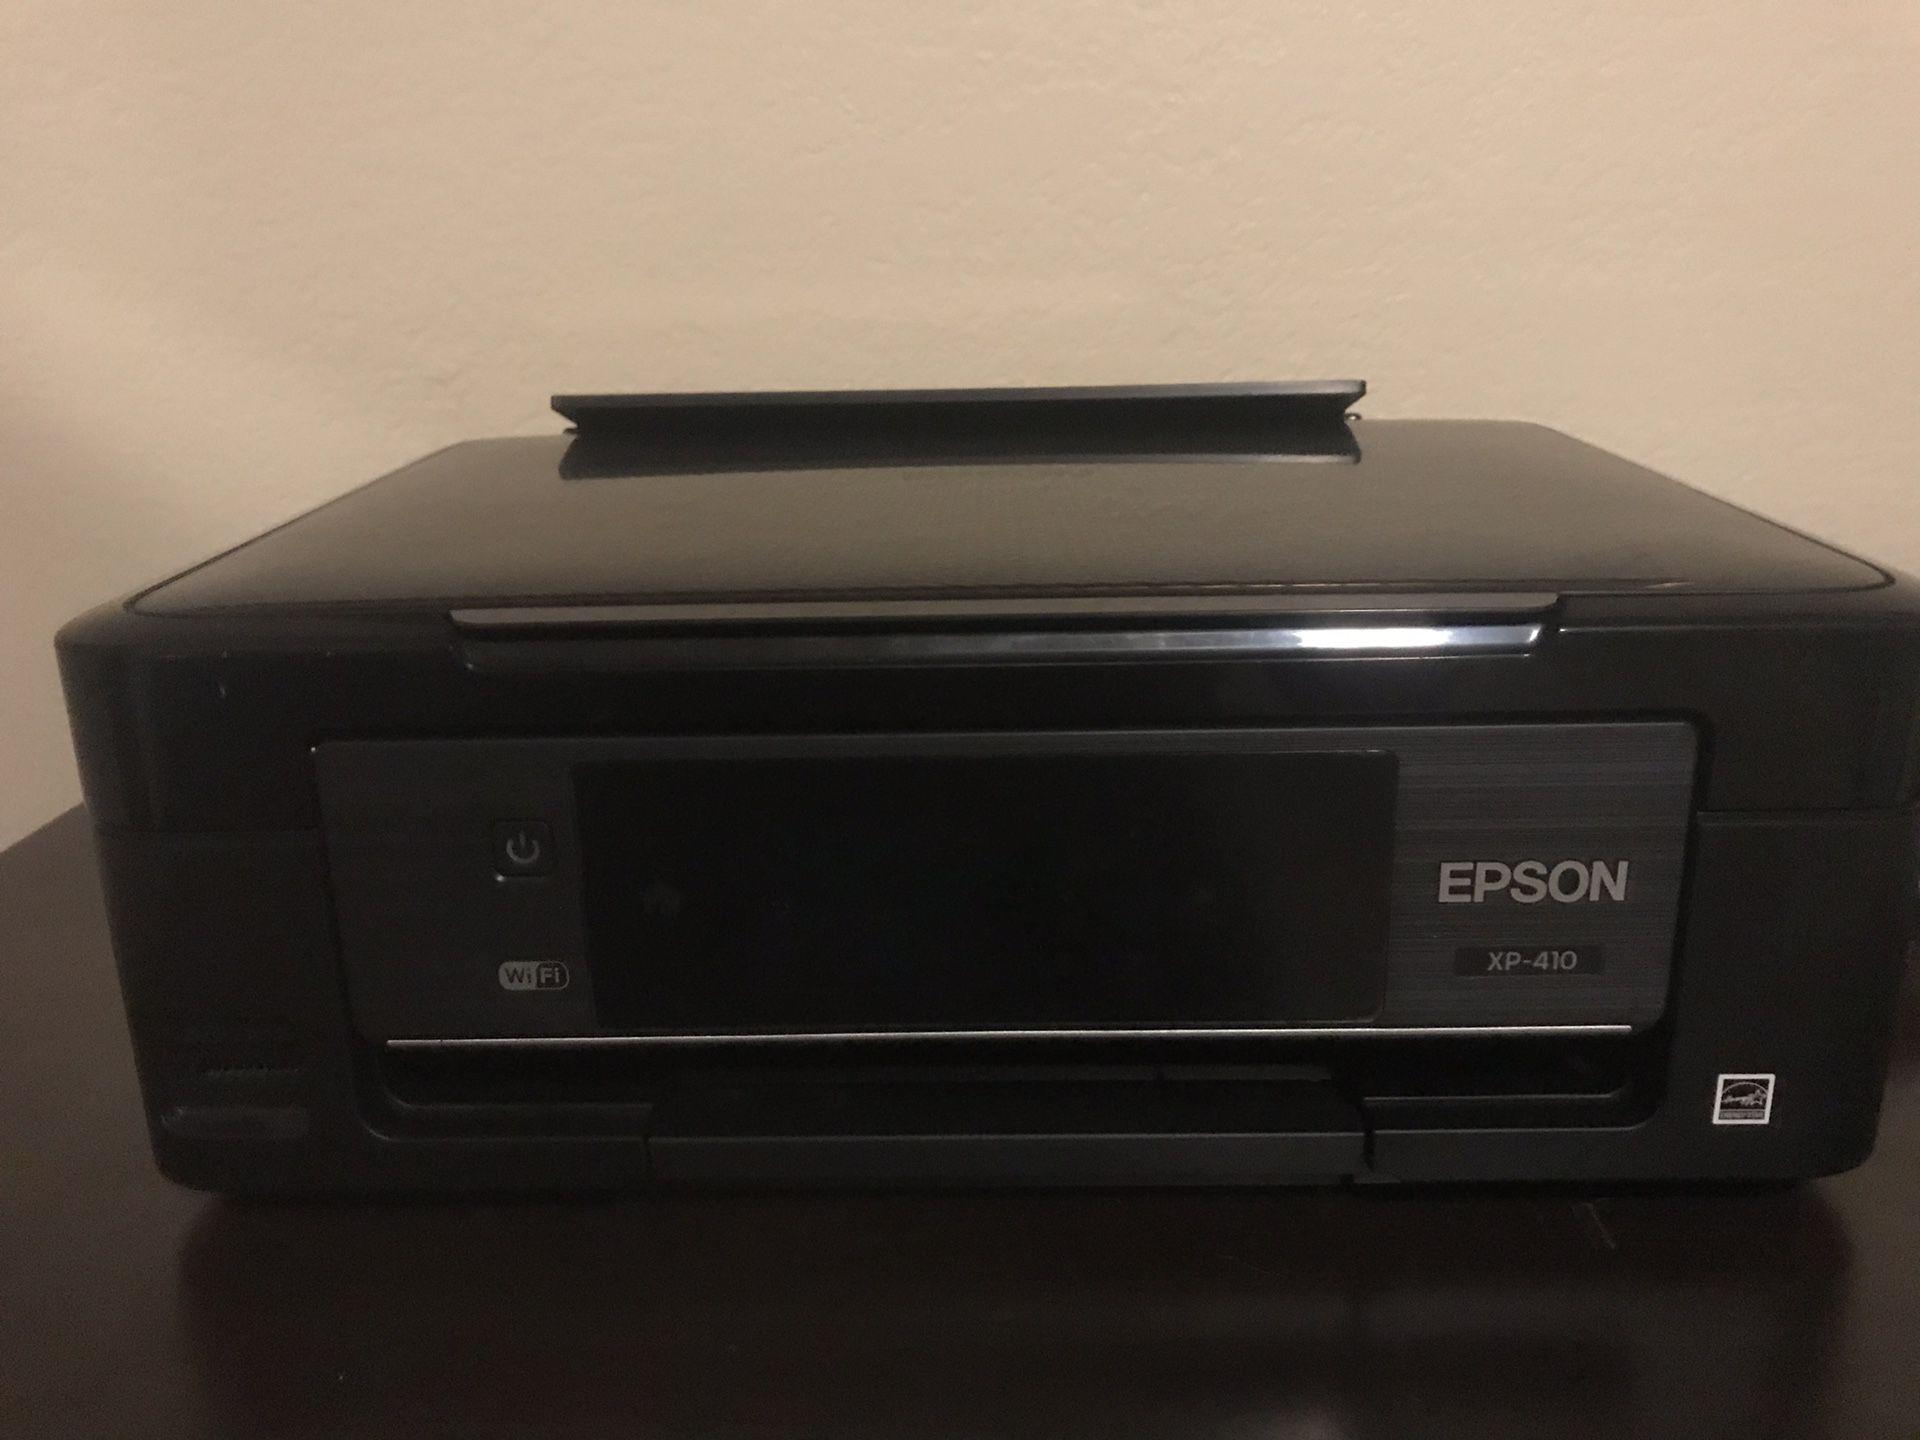 EPSON XP 410 Color Photo Printer/Scanner